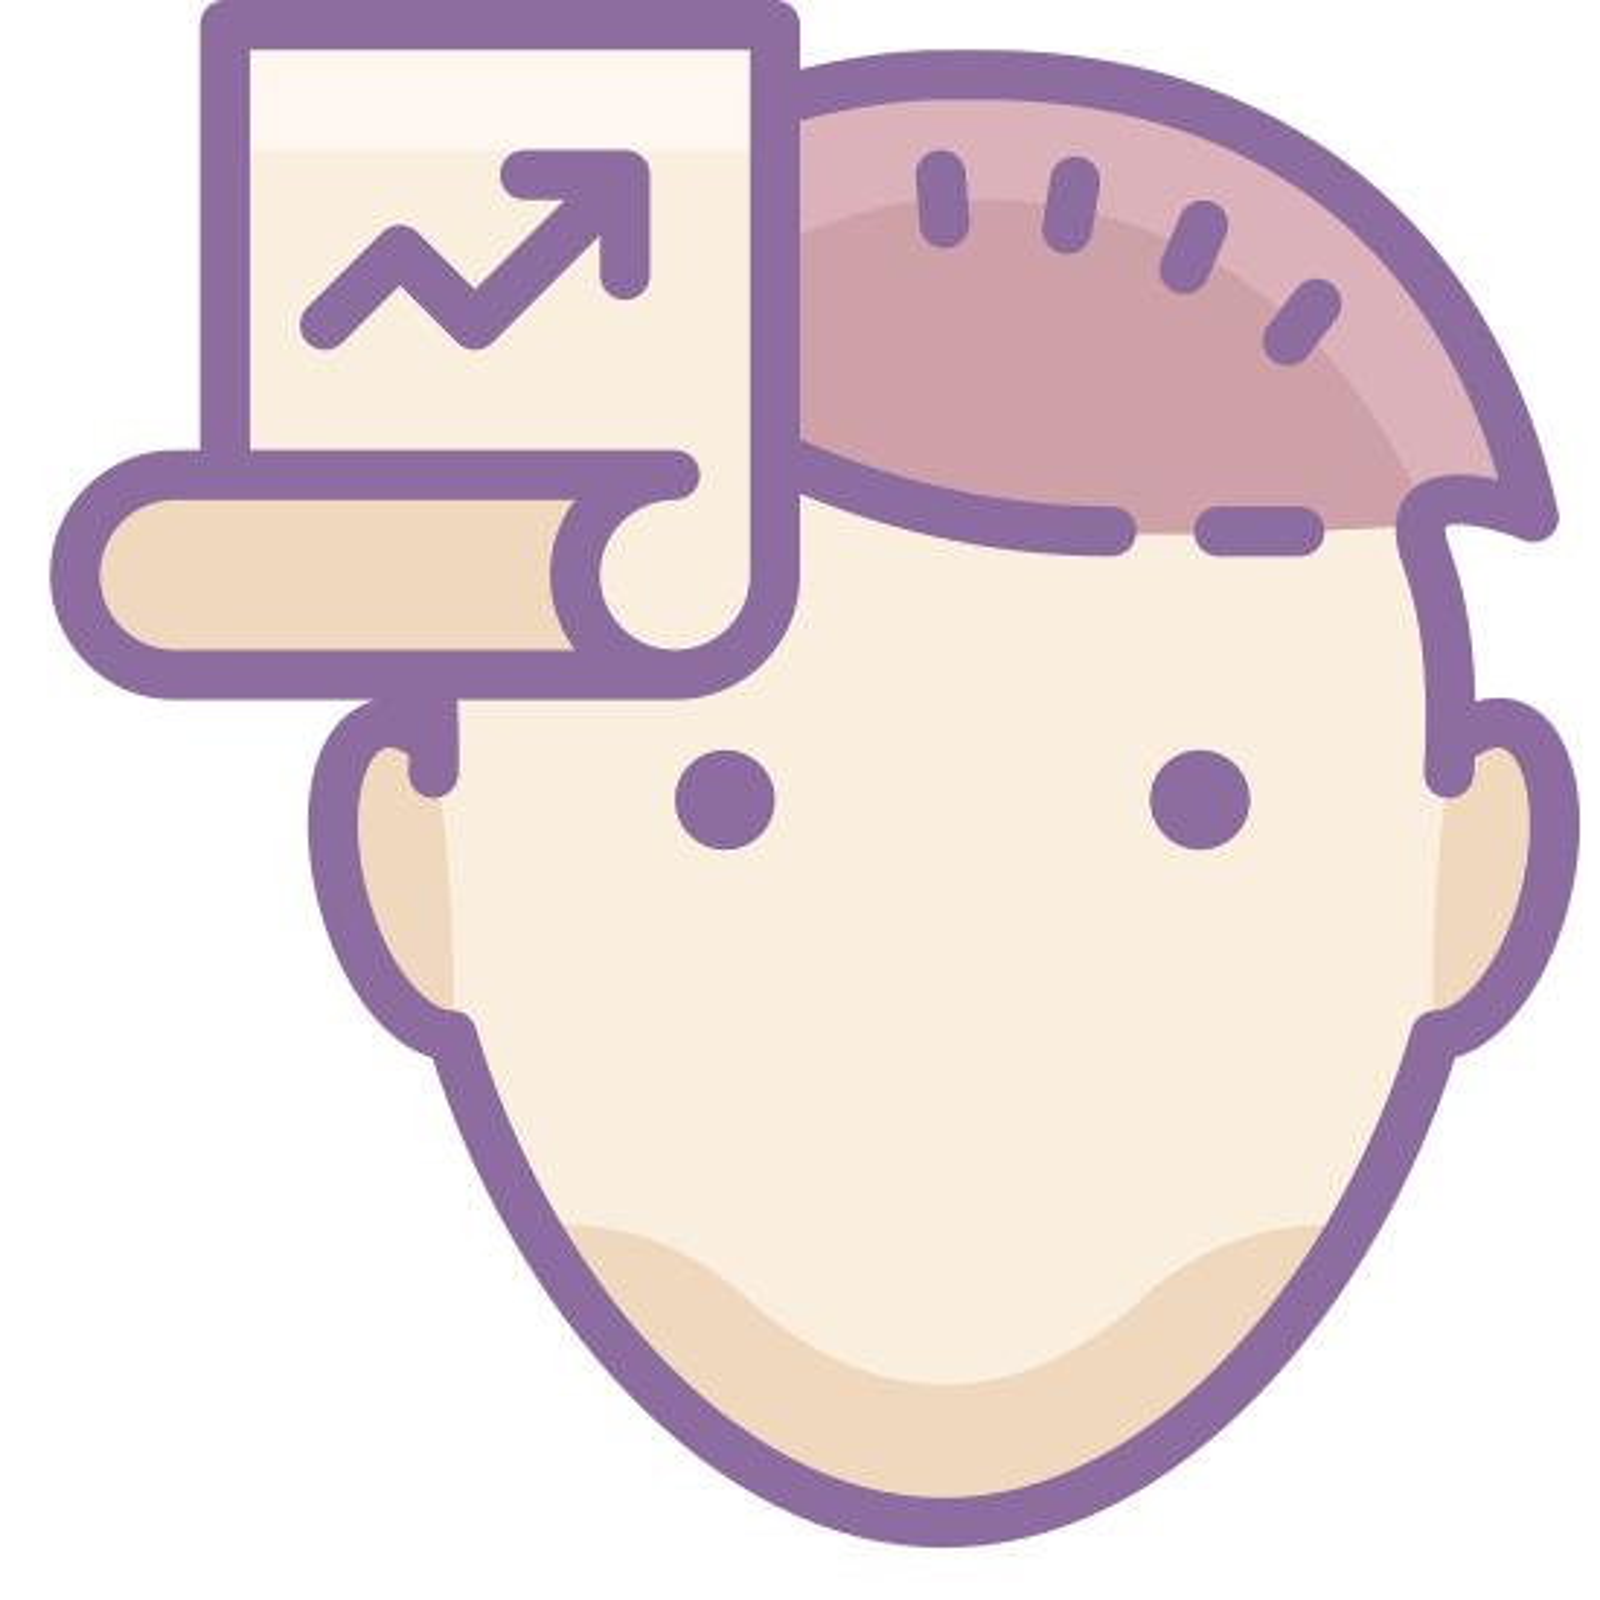 Analyzing Skill icon